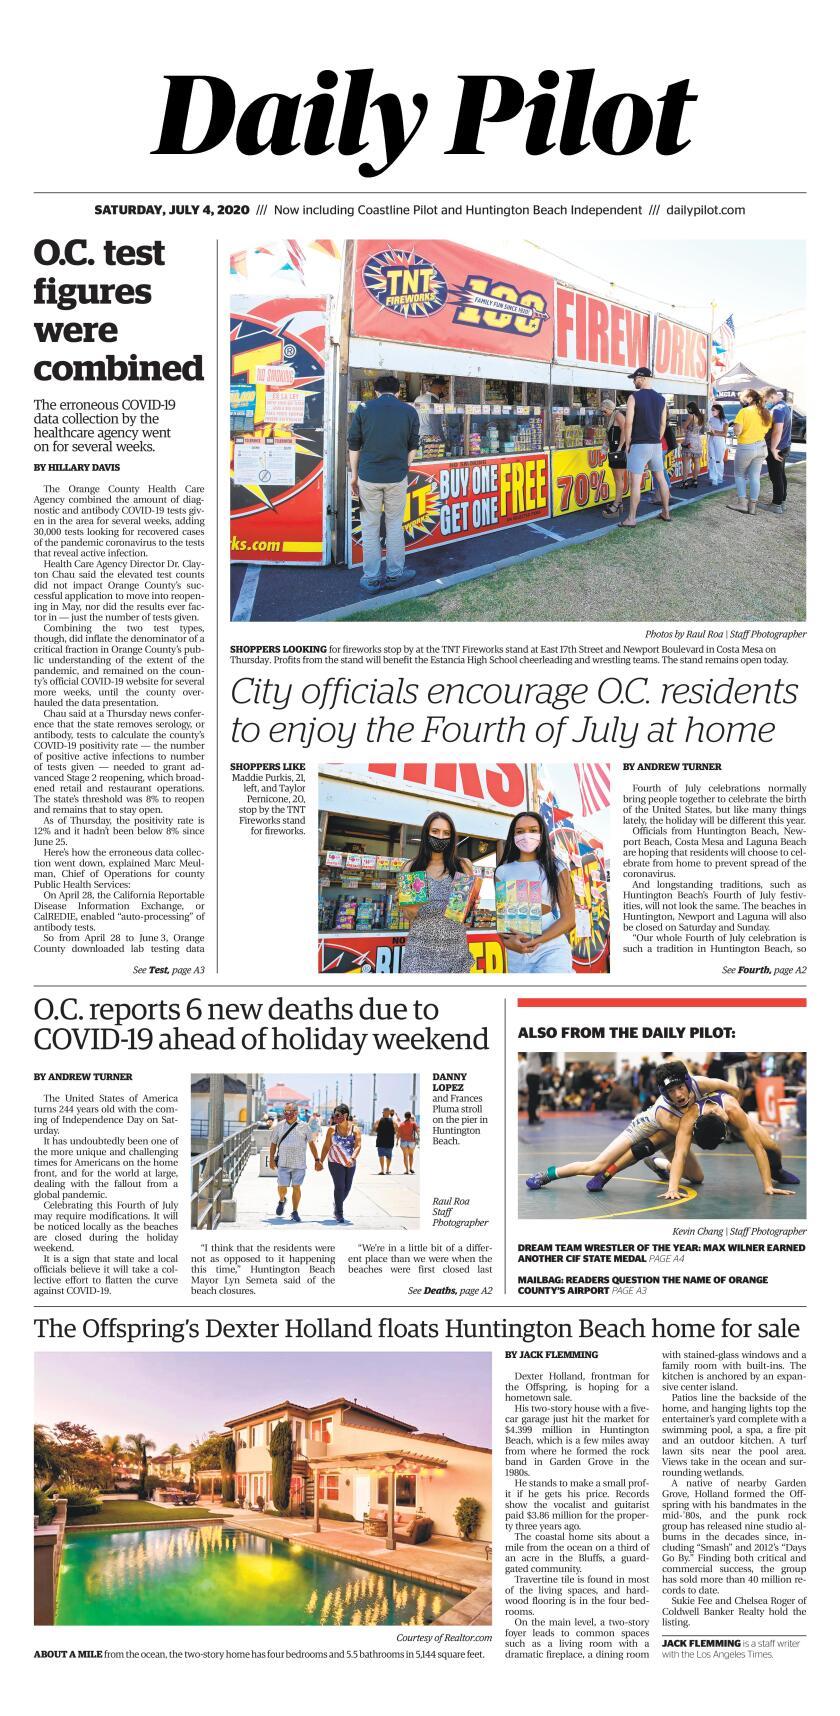 Daily Pilot e-Newspaper: Saturday, July 4, 2020 Cover